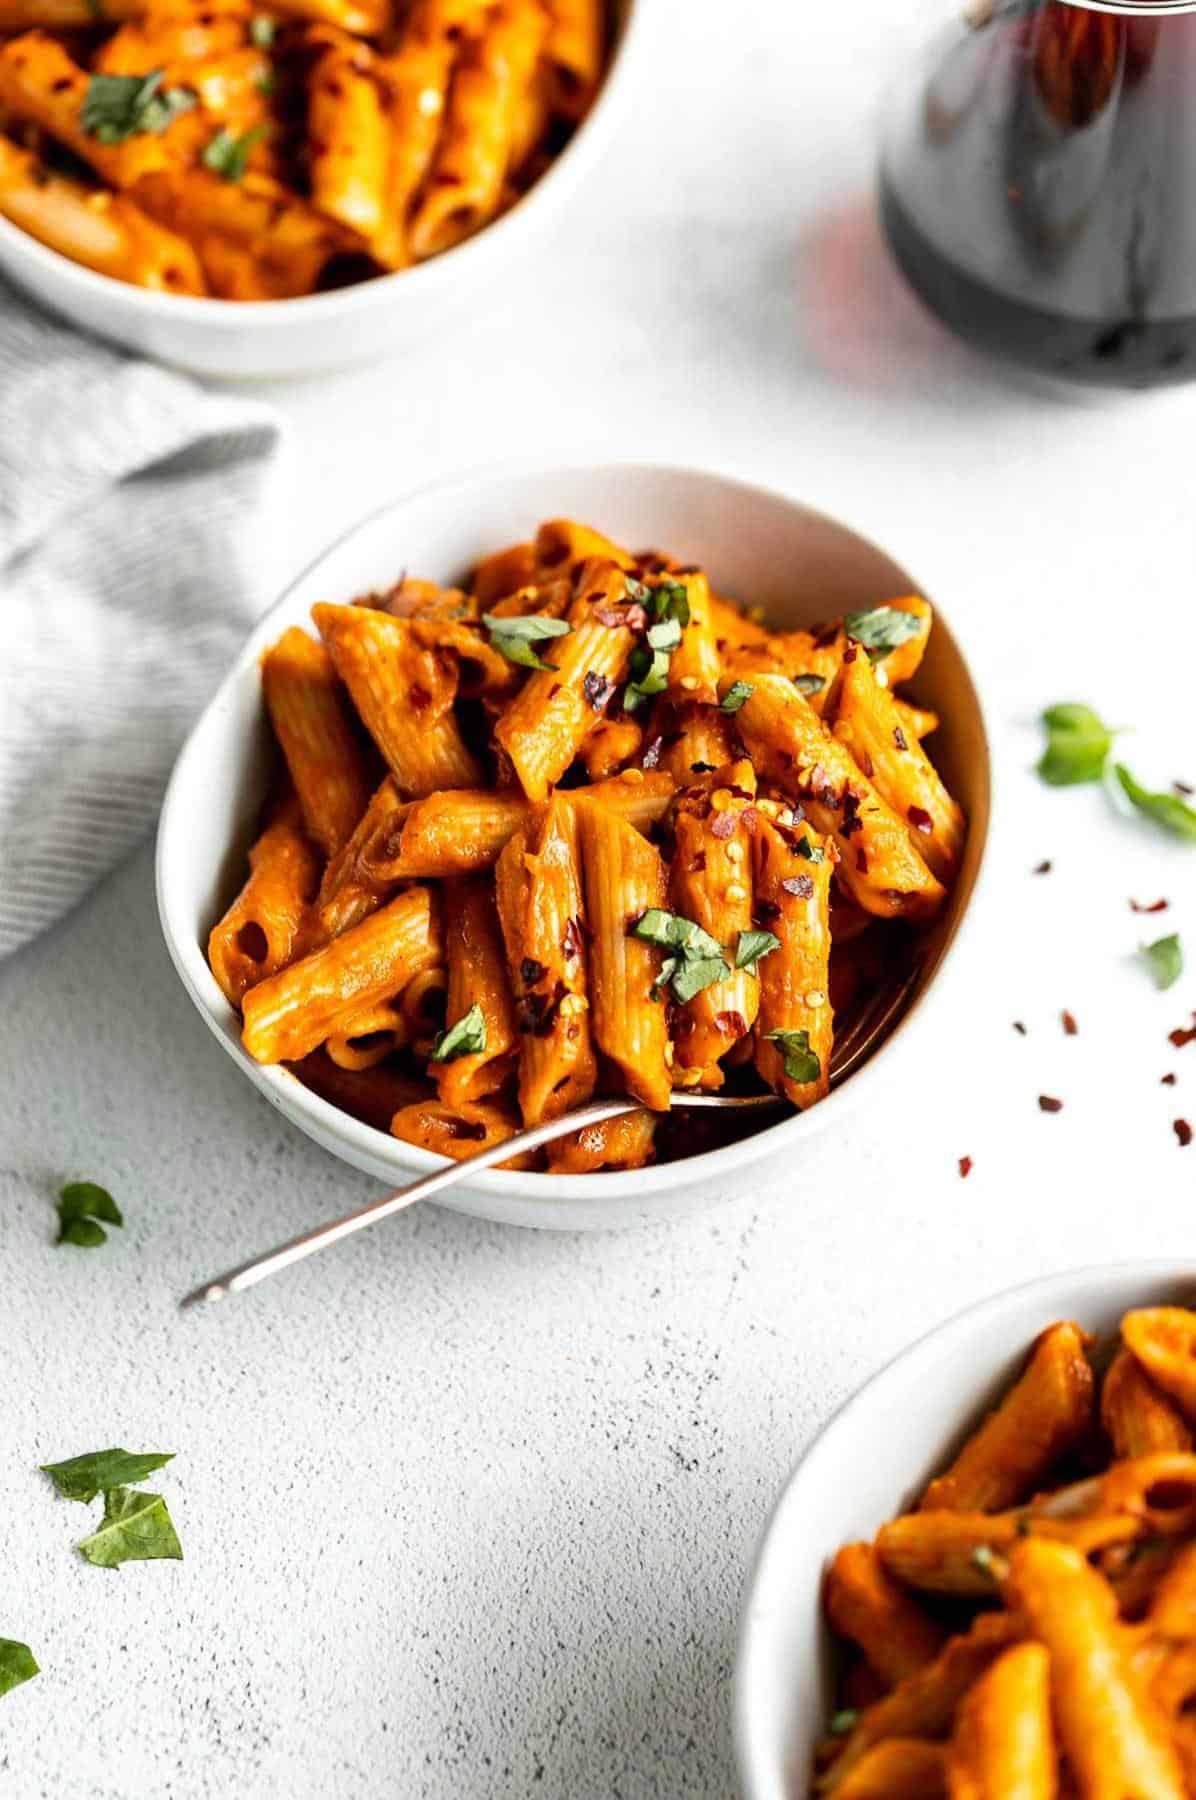 three bowls of pasta with the vegan pasta sauce